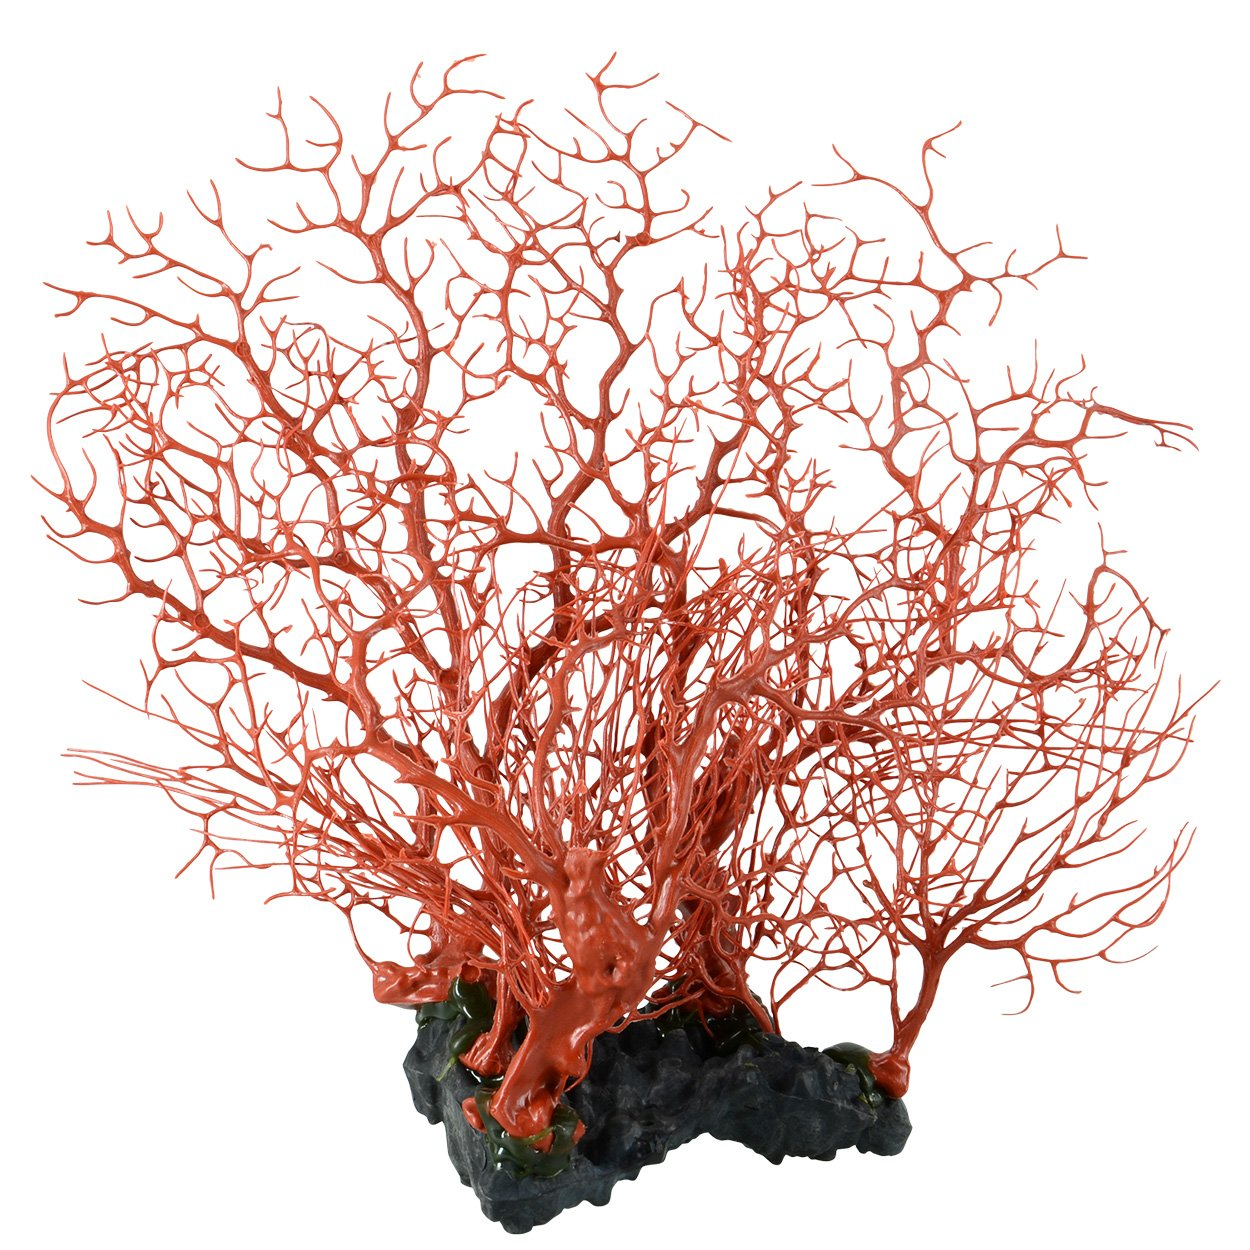 Underwater Treasures Sea Fan Coral - Red